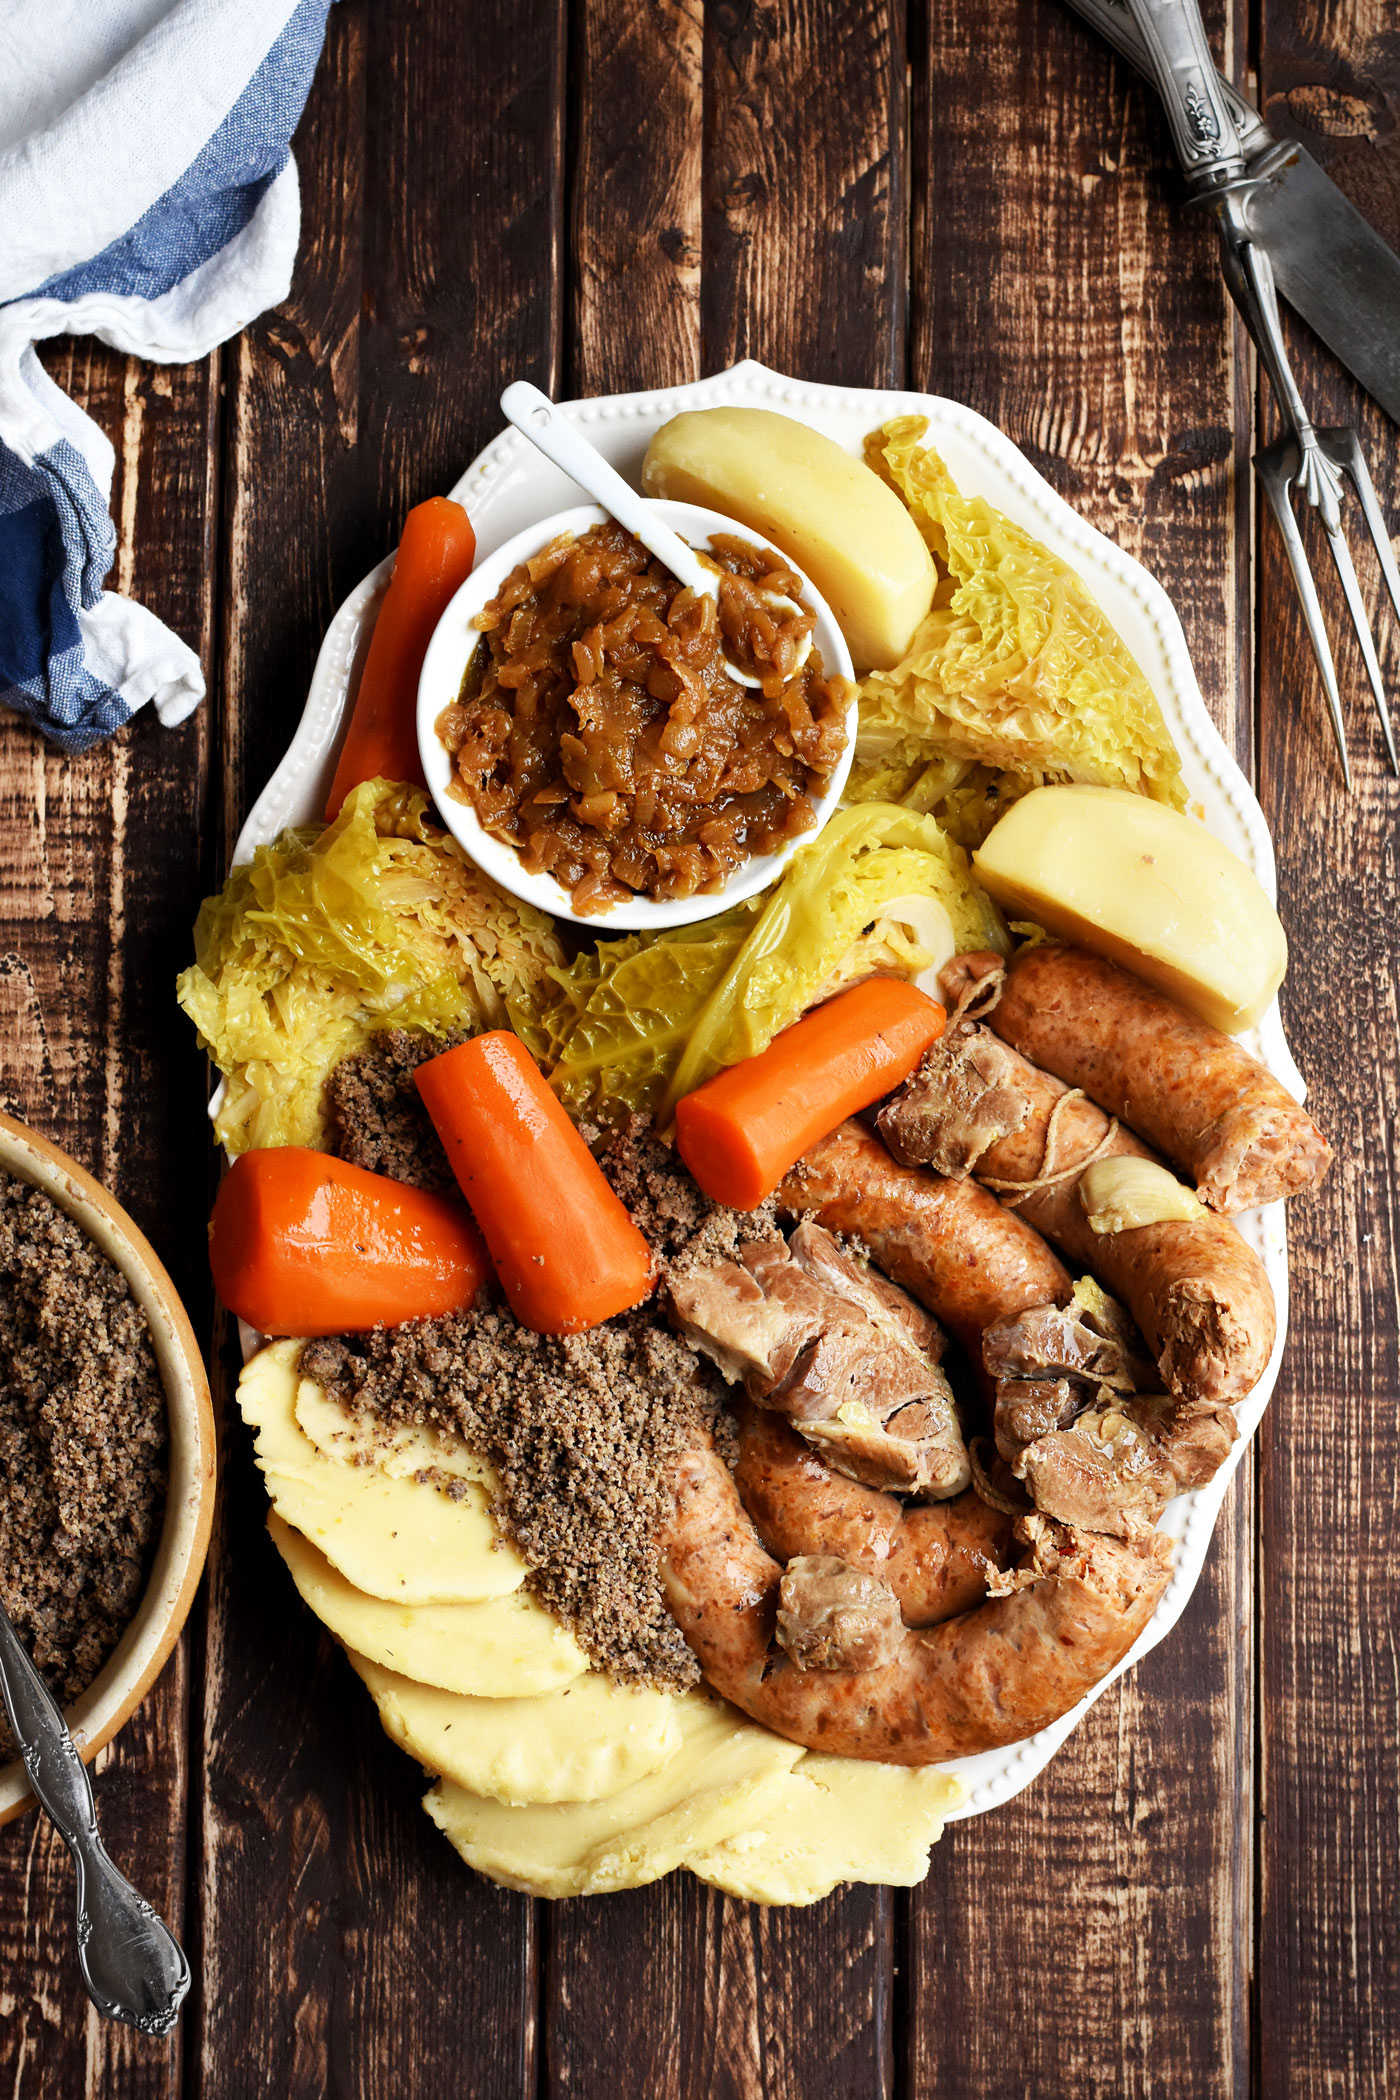 Buckwheat with chanterelles - hearty dish